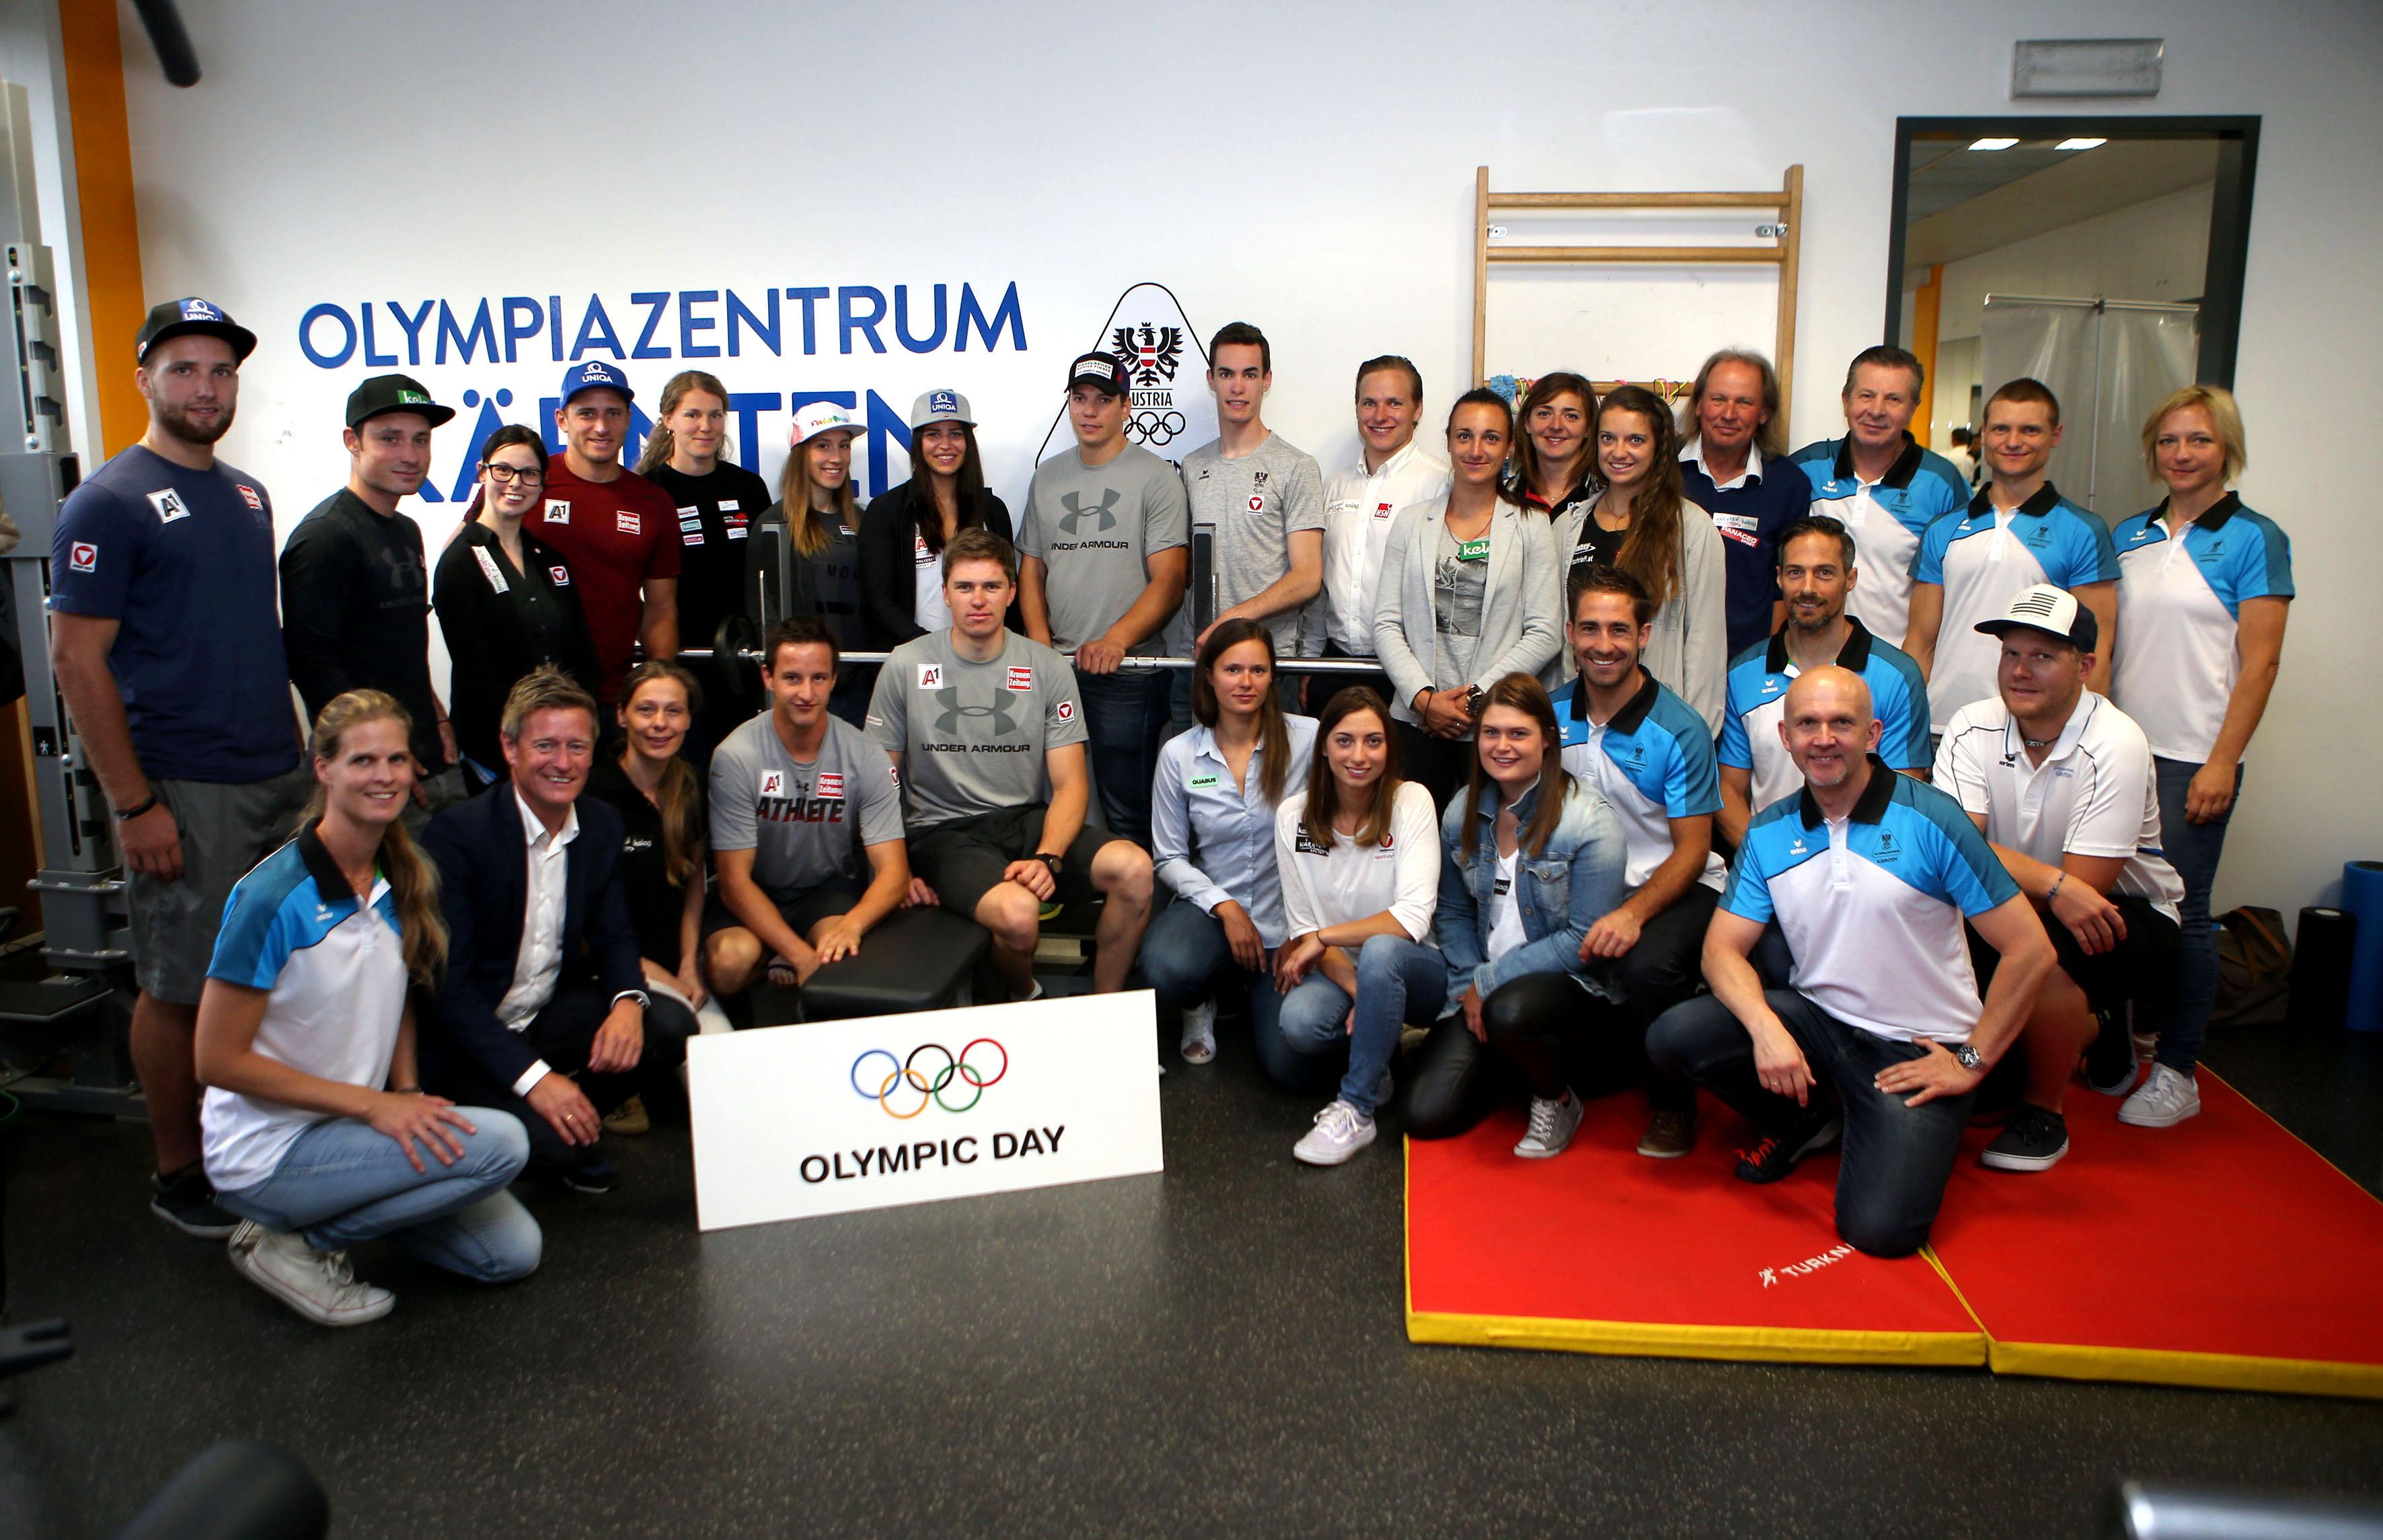 Sportlerfruehstueck. Olympiazentrum.  . Klagenfurt, am 22.6.2018. Foto: Kuess